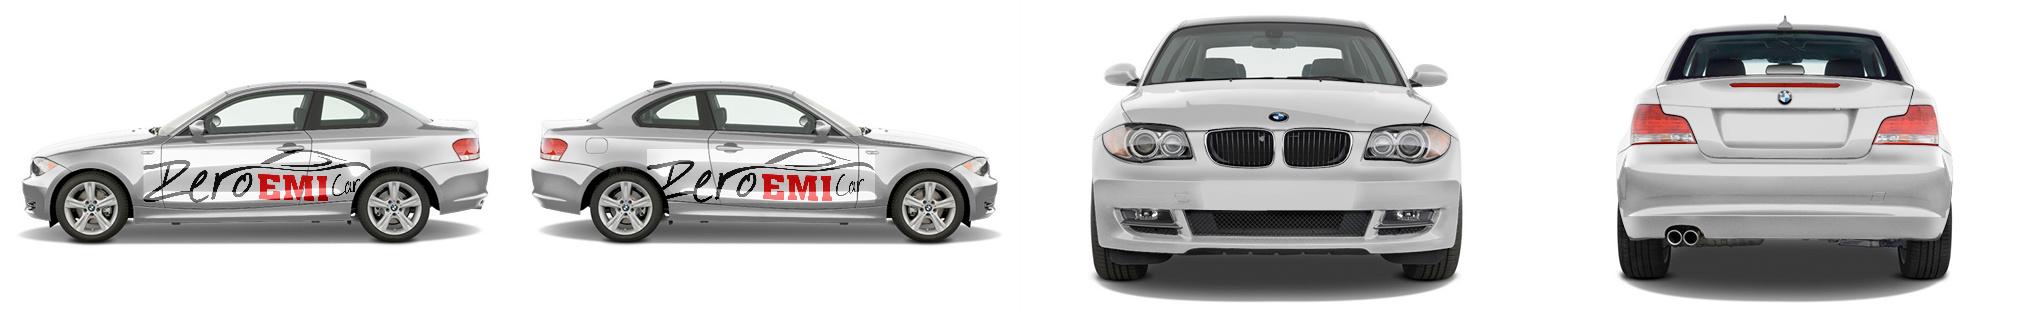 Zero Emi Car Sports Coupe Wrap